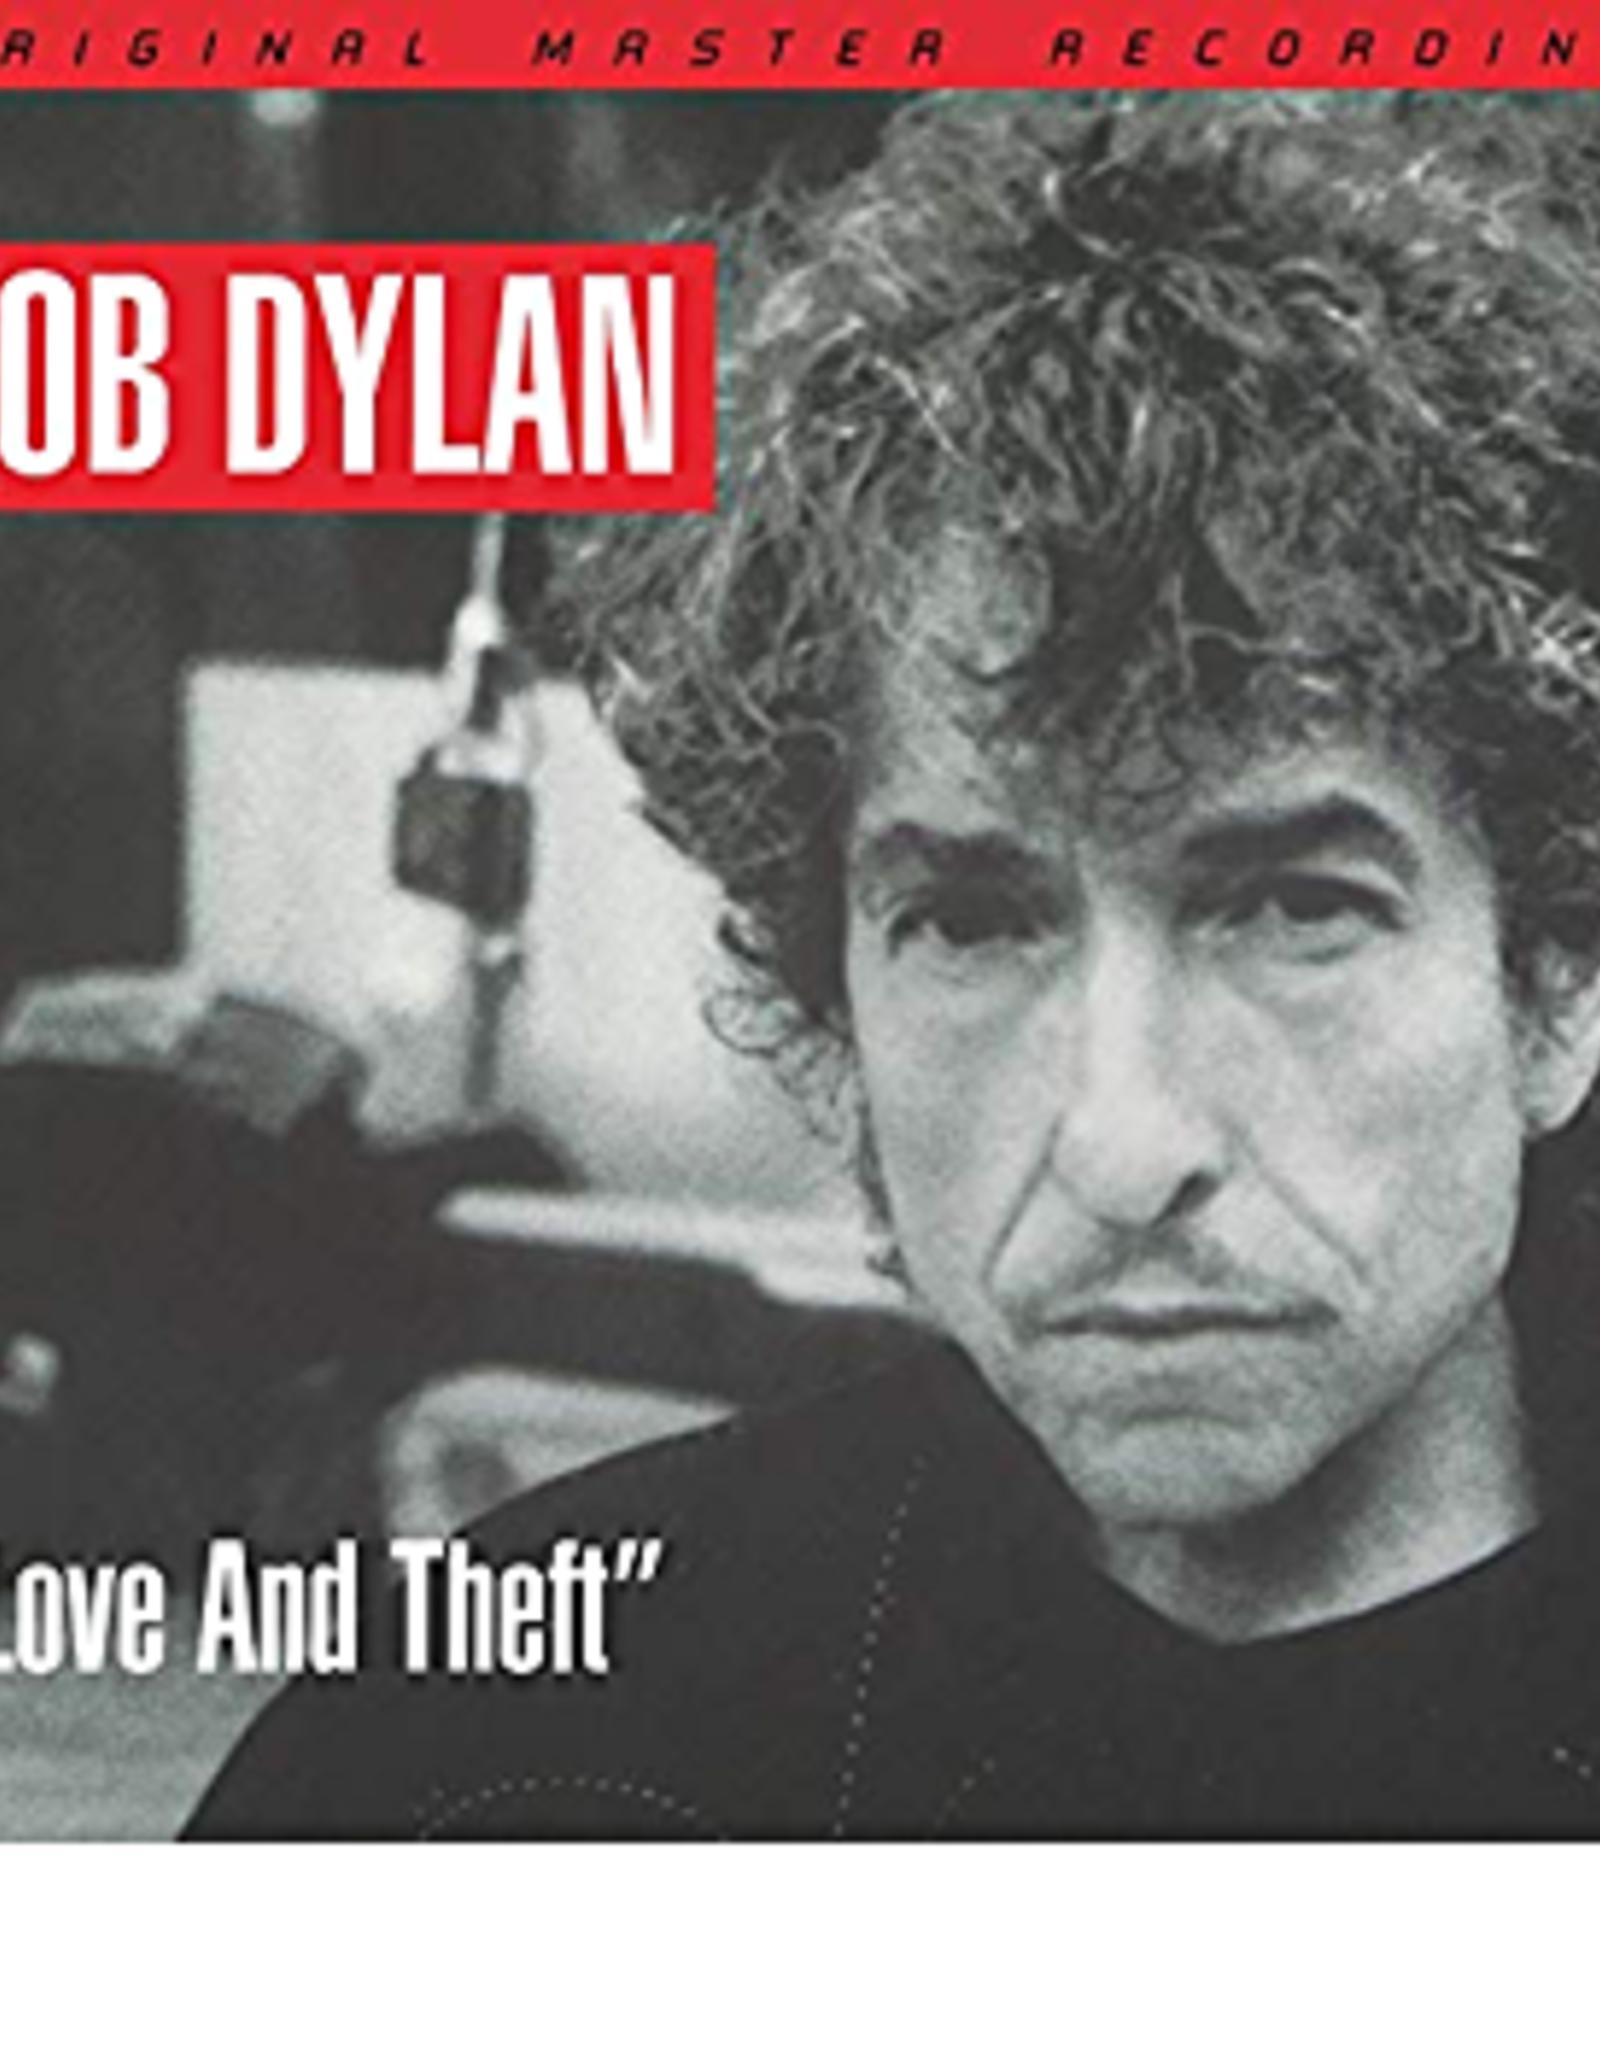 Bob Dylan - Love & Theft (2 Lp'S -180 Gram)